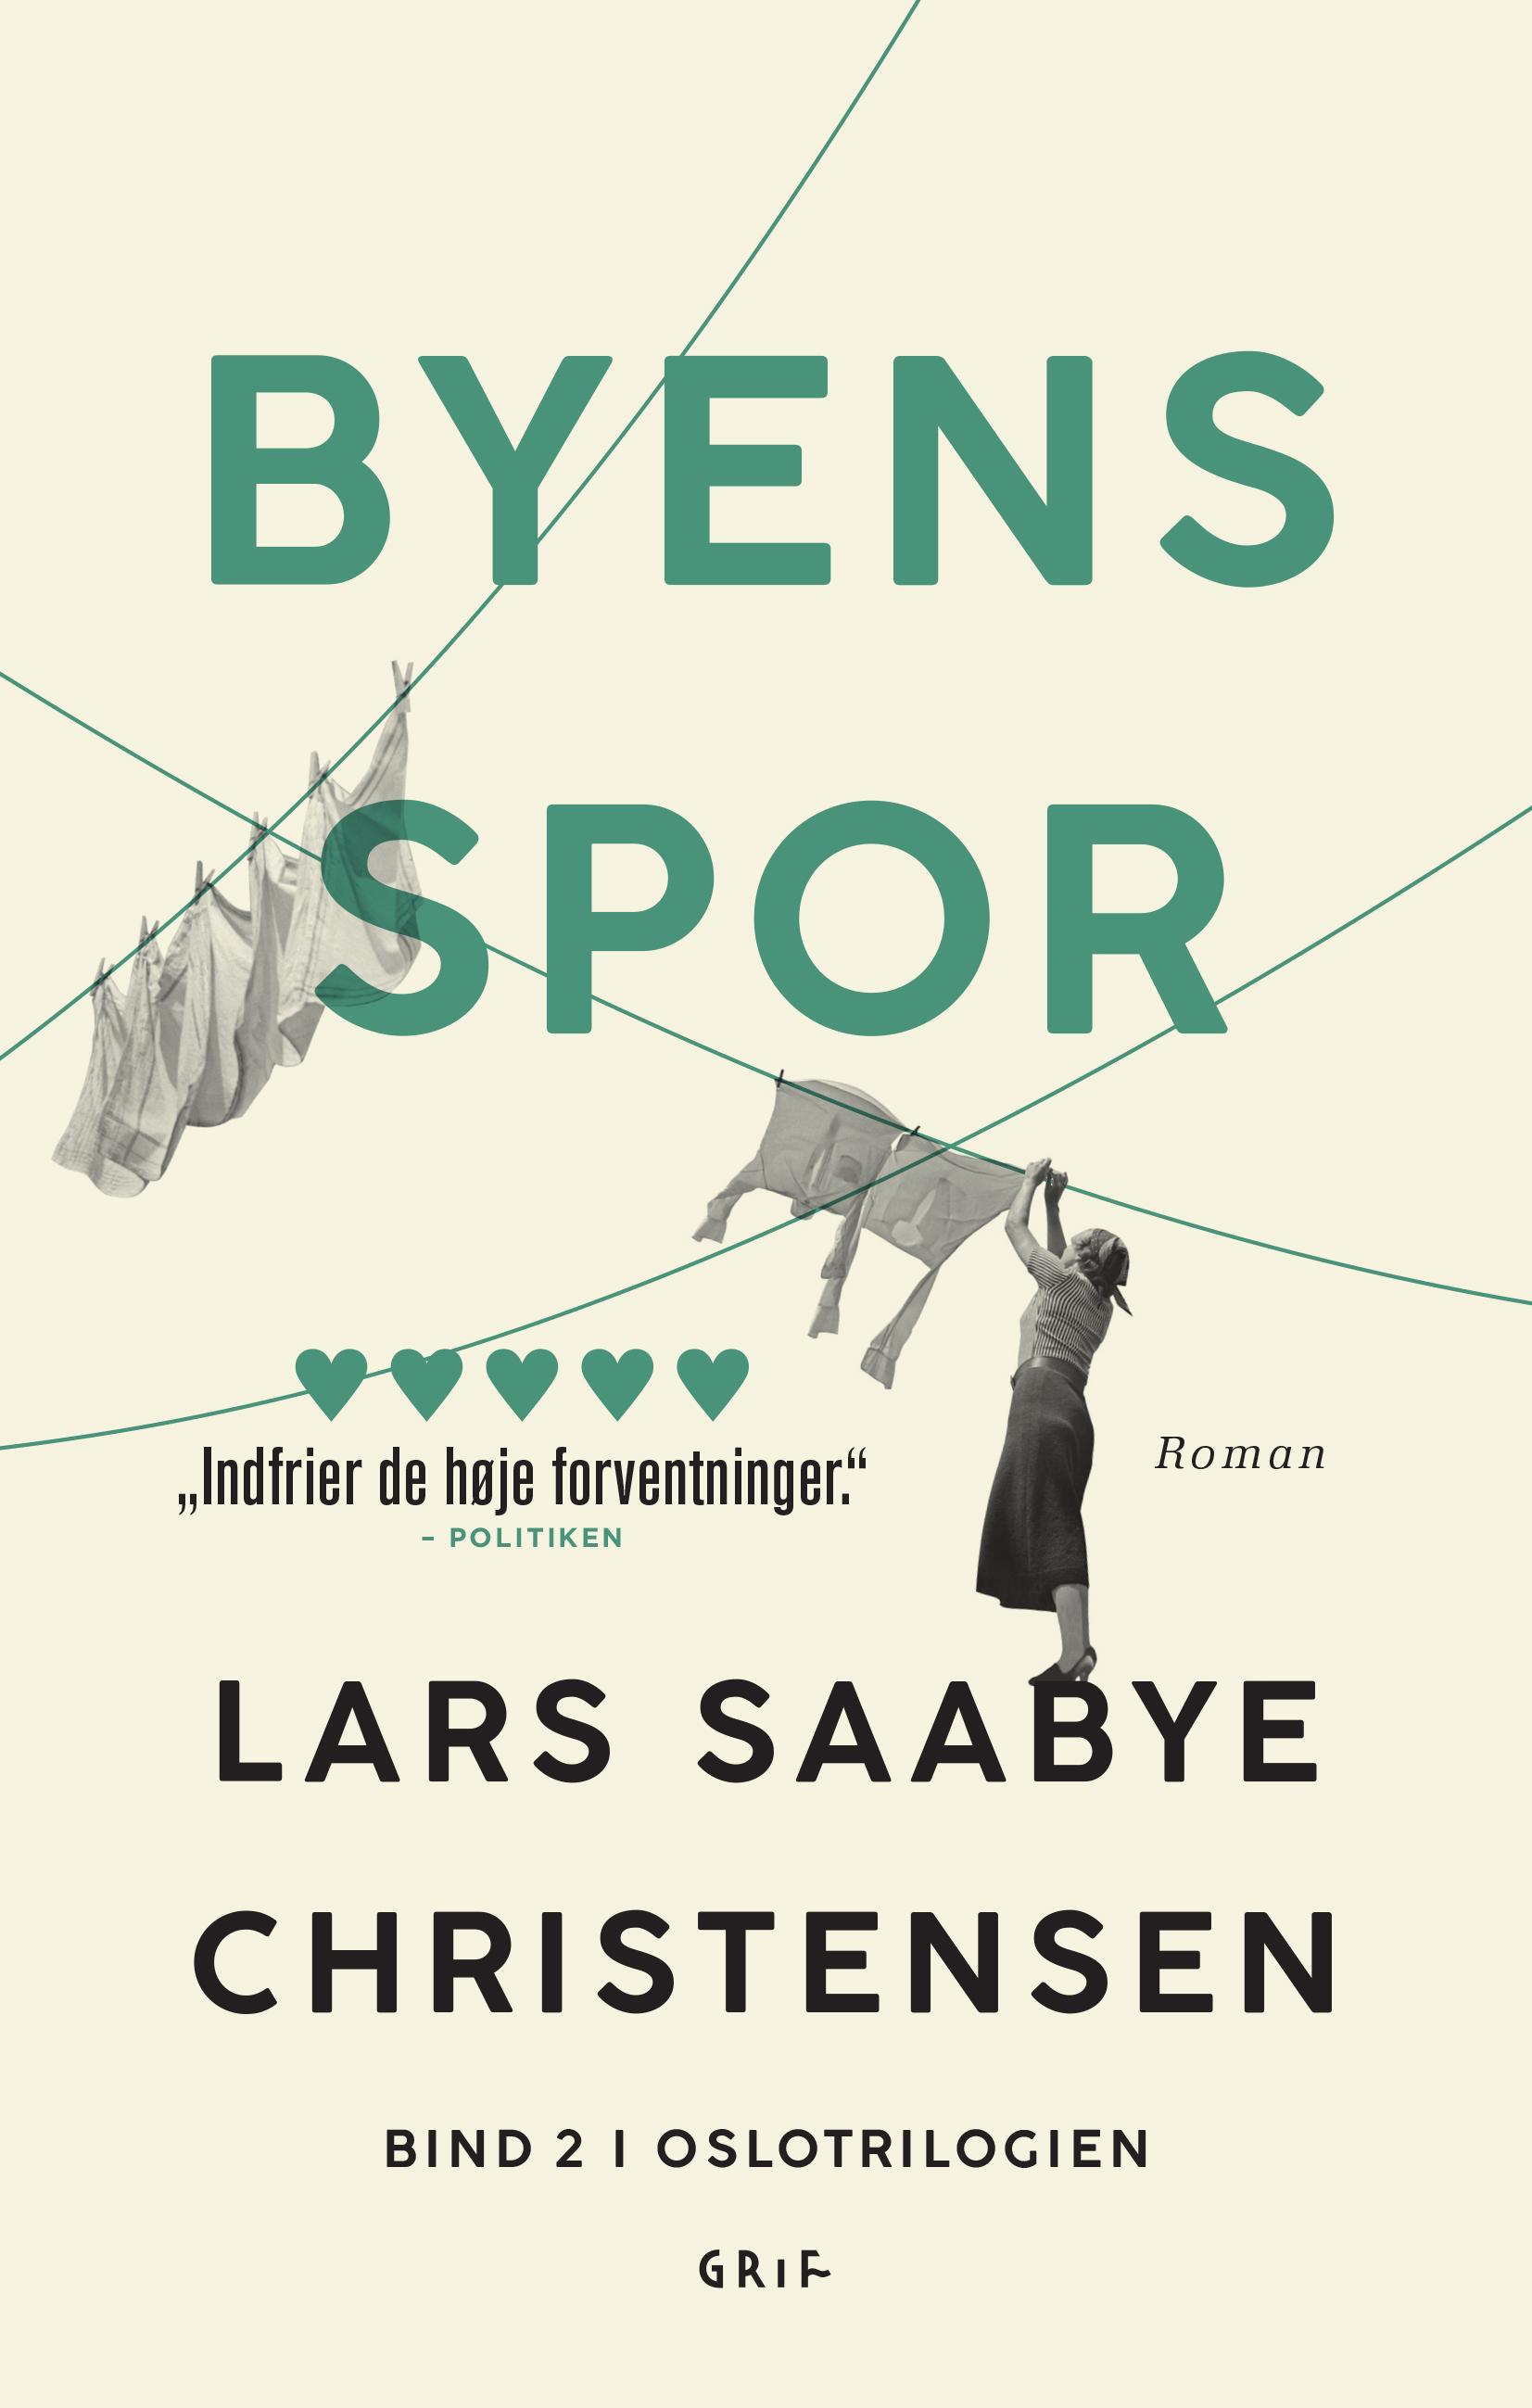 Byens spor: Byens spor 2 PB - Lars Saabye Christensen - Bøger - Grif - 9788793661974 - 24/1-2020